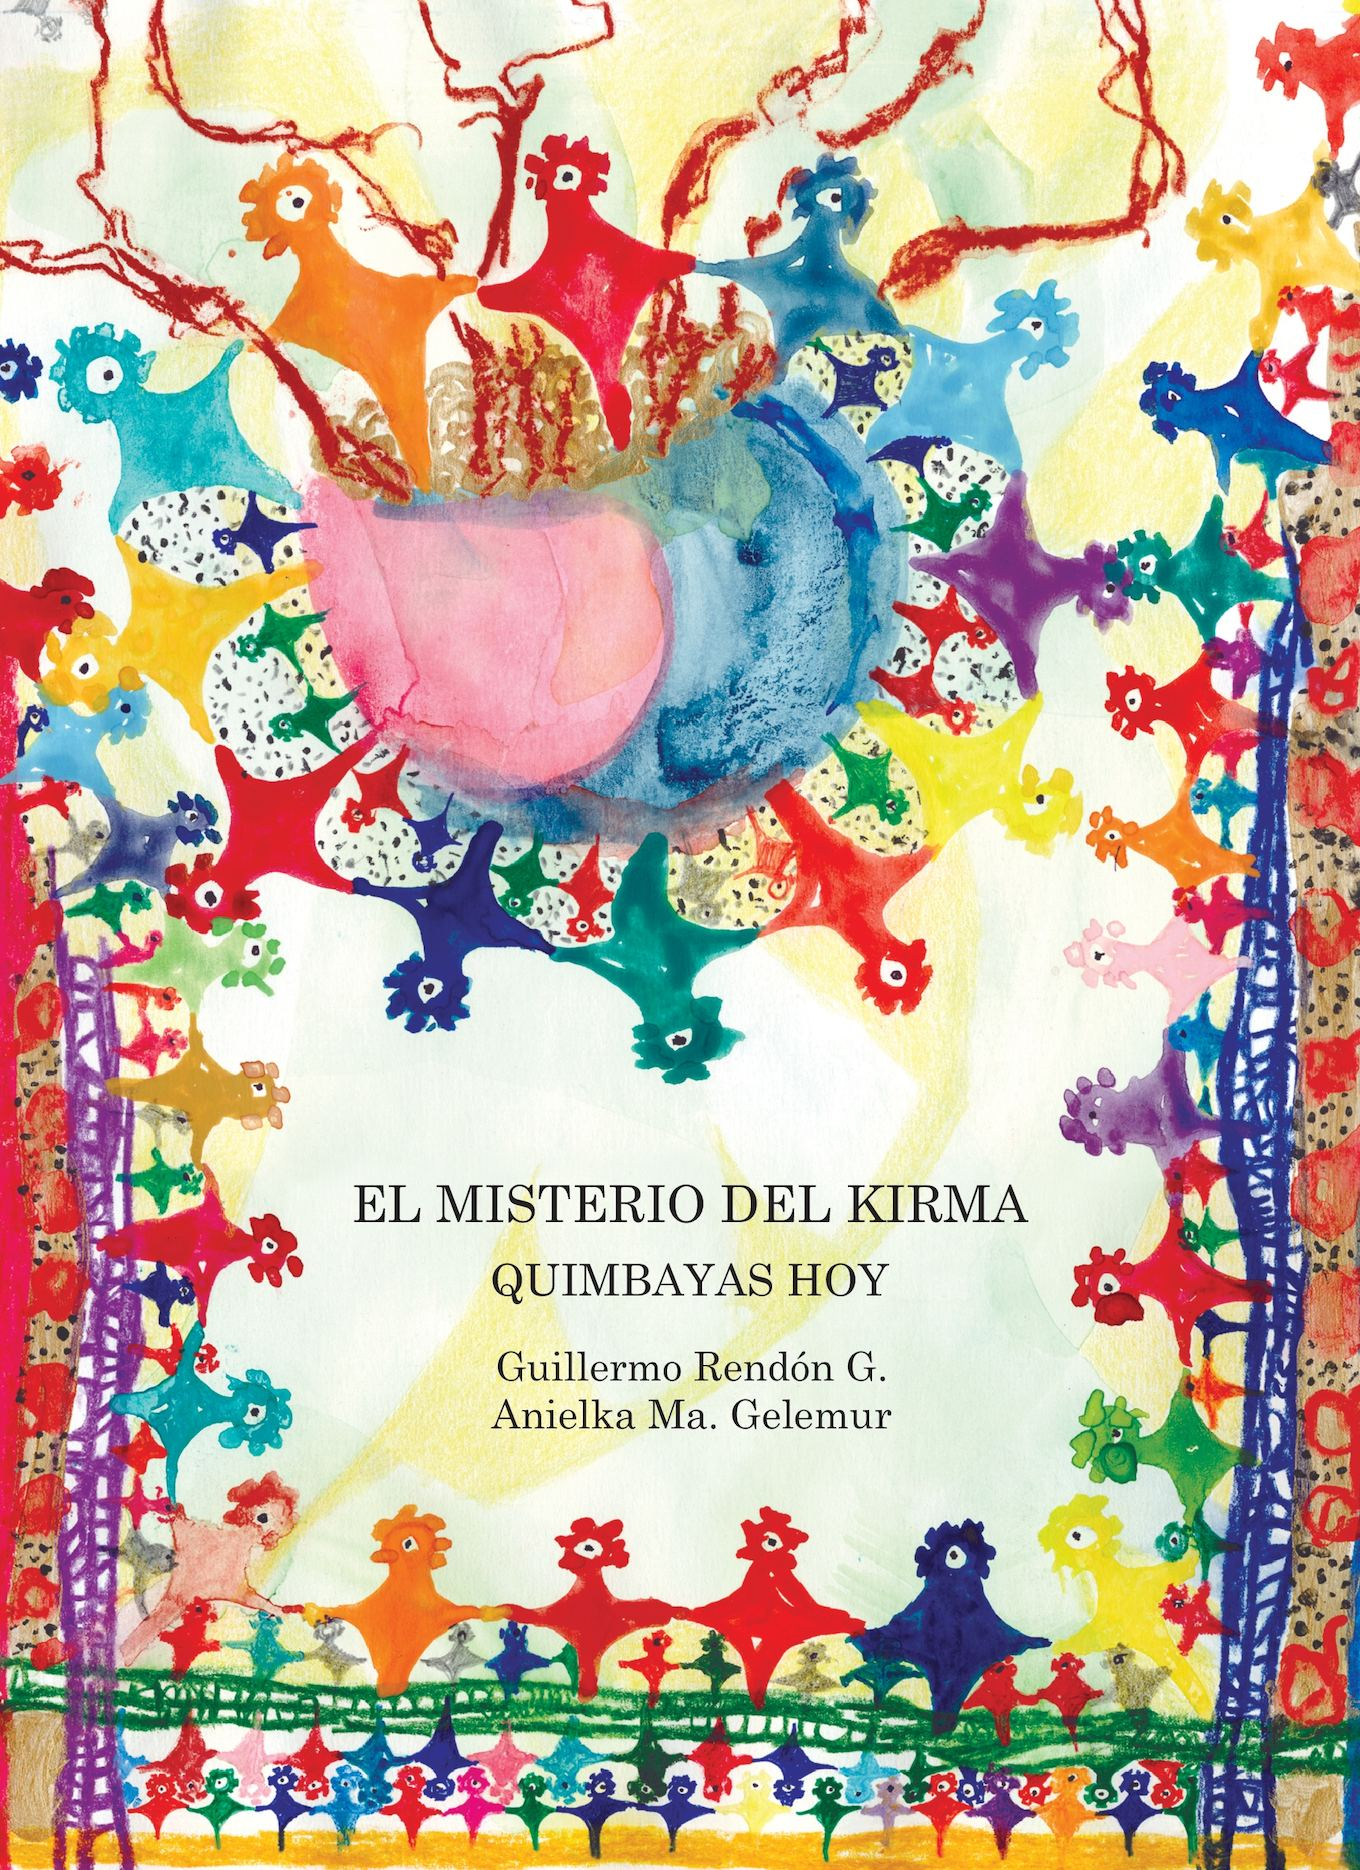 Calam O Los Kumba Quimbaya El Misterio Del Kirma G Rendo N  # Baal Muebles Sevilla